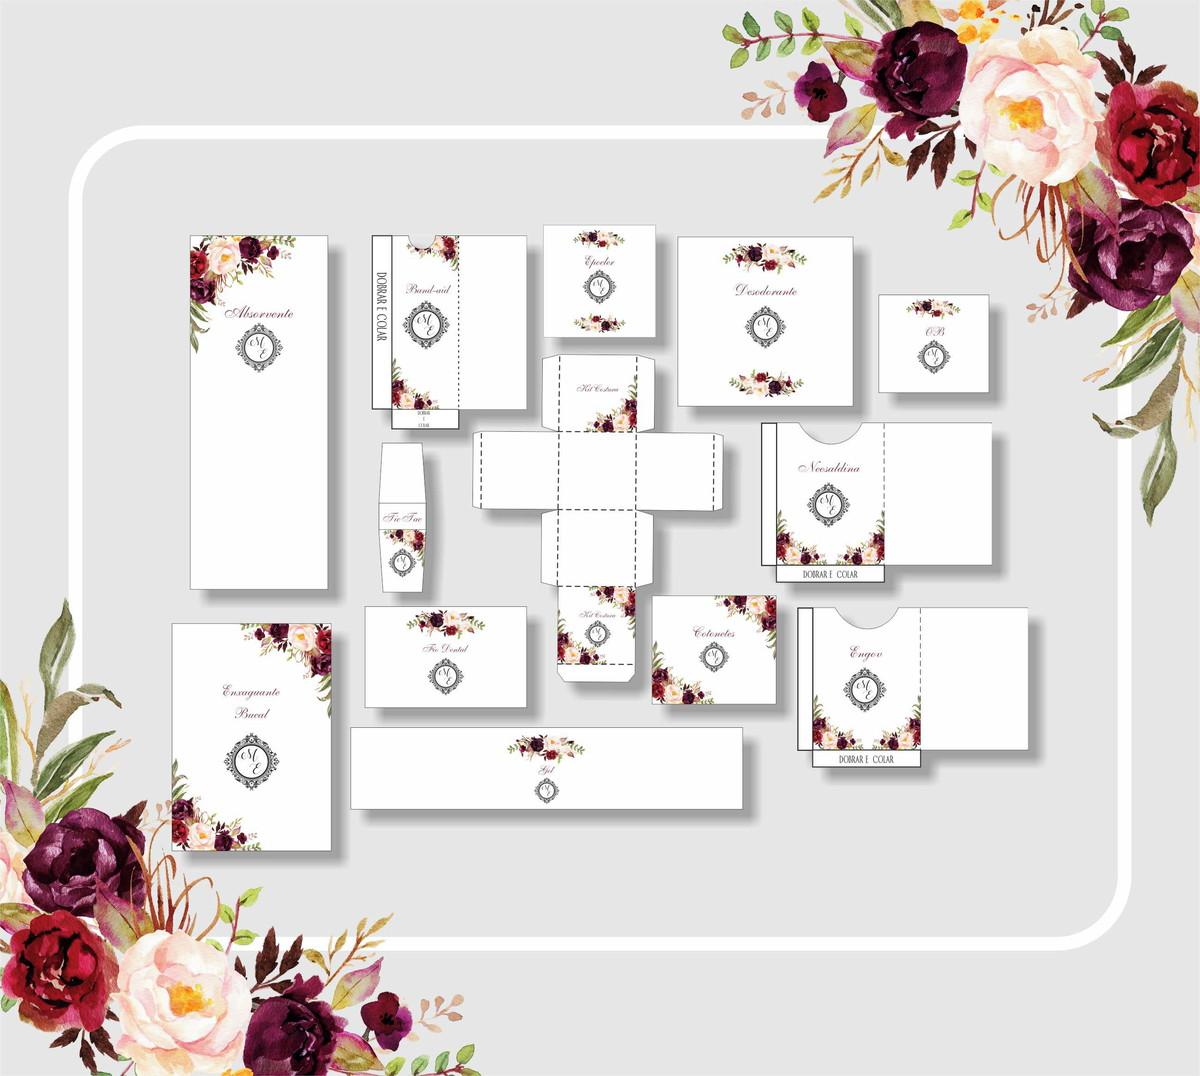 Kit Banheiro Casamento Digital Marsala No Elo7 Fe Franco Artes